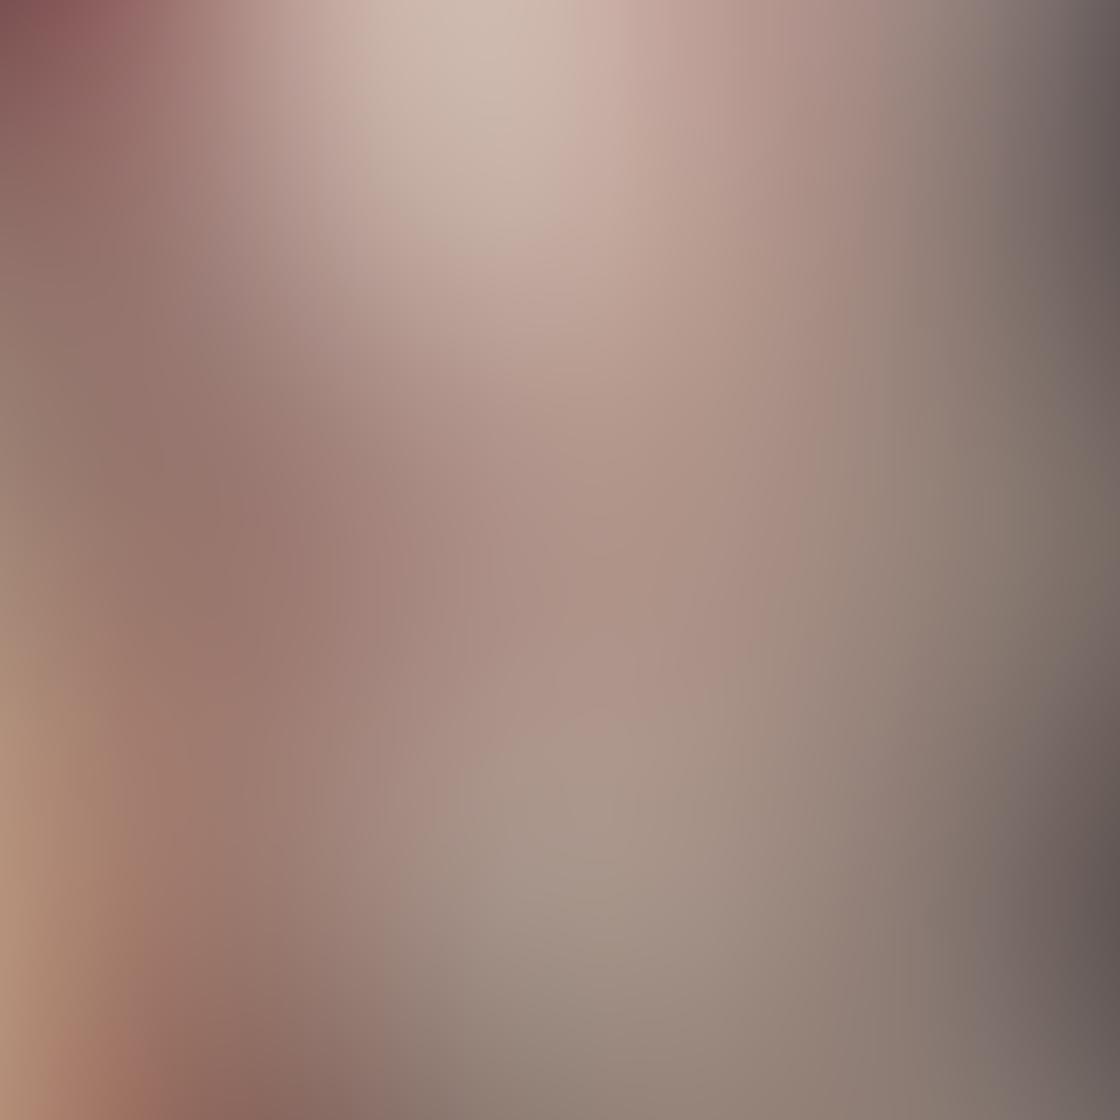 iPhone Angle Photo 15